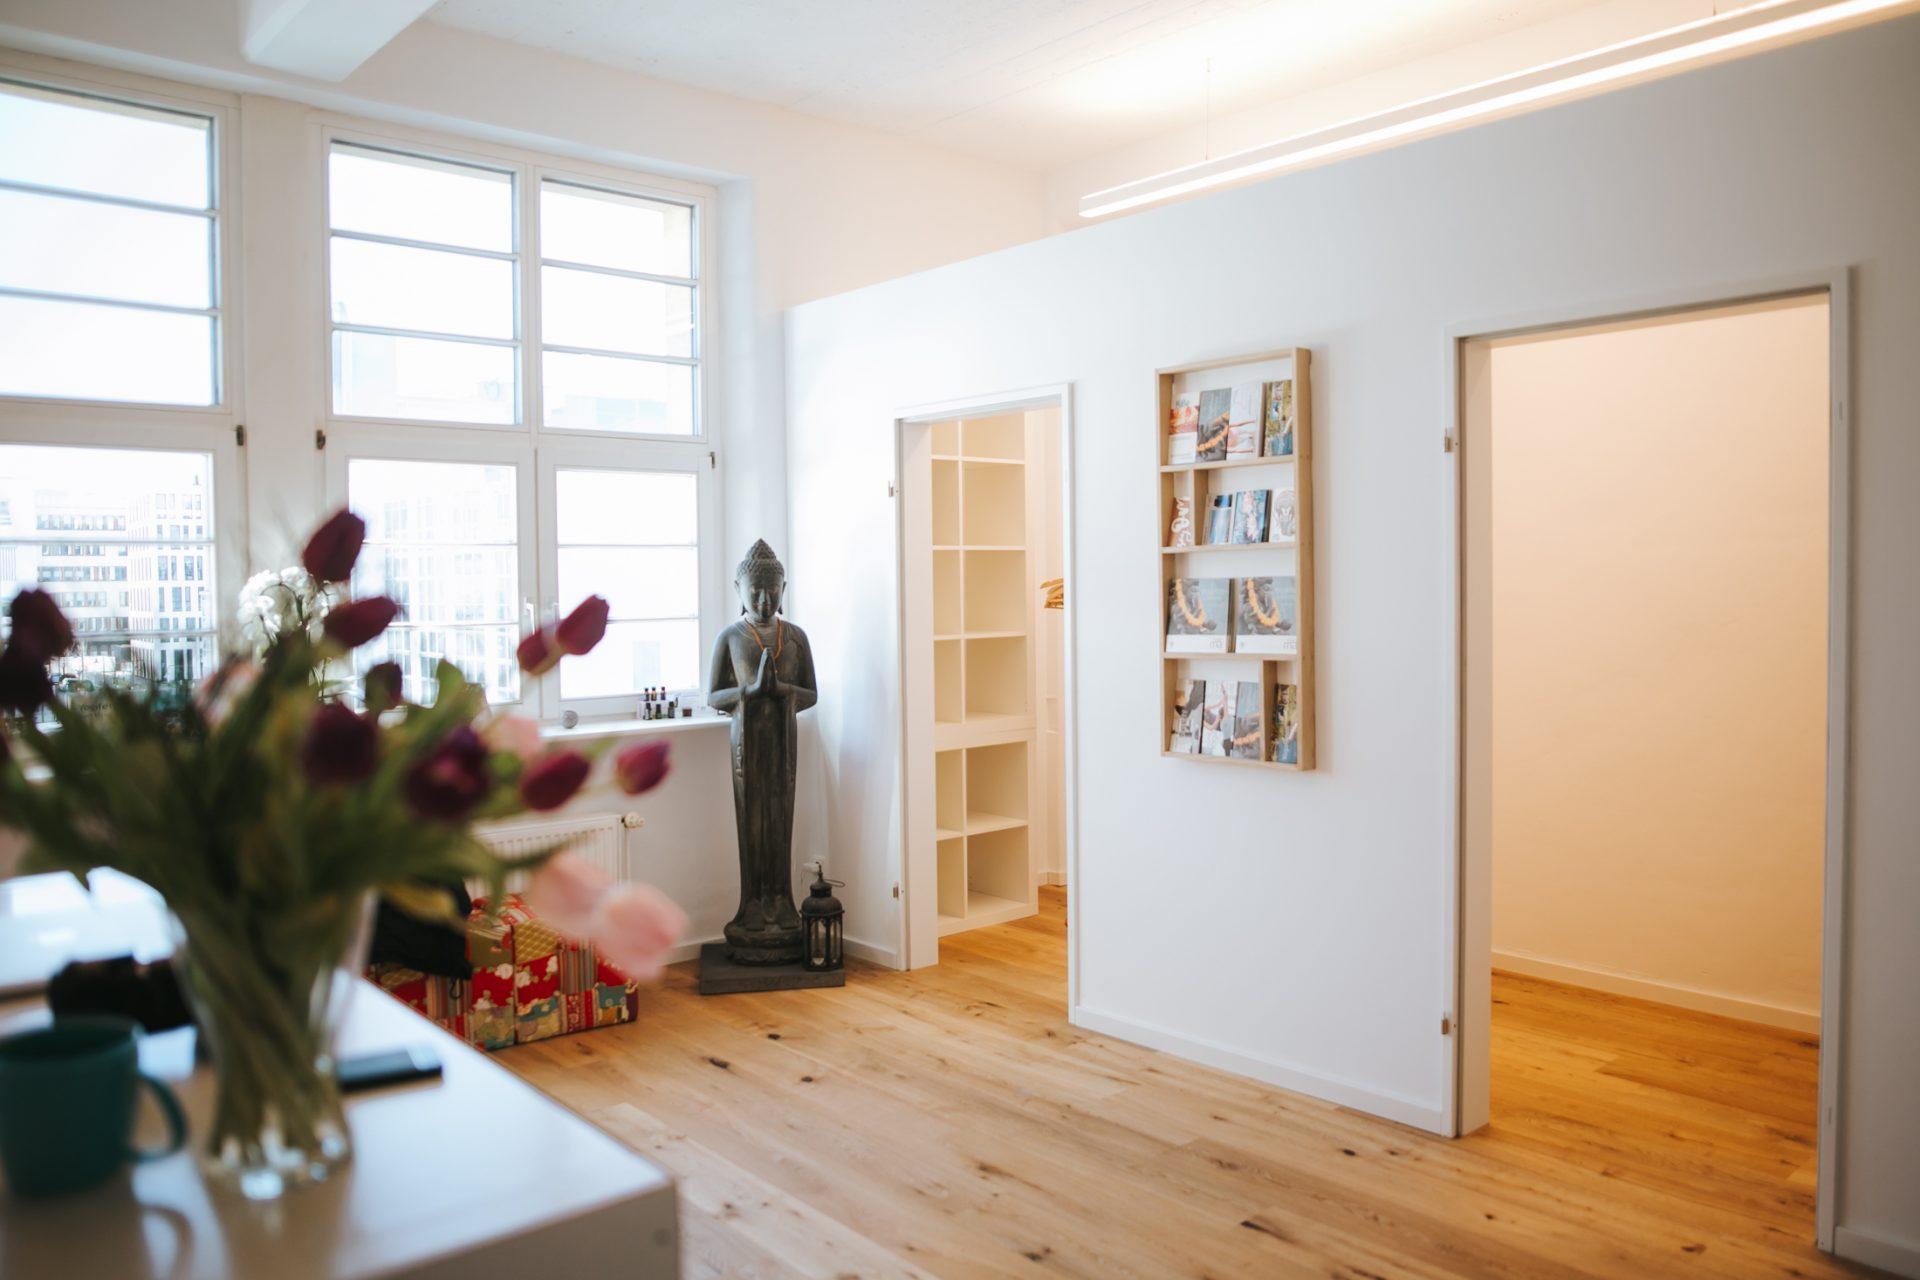 Yogastudio-yoga-ma-in-Stuttgart-Vaihingen-und-Umgebung-kleinYogaMaStudio2020-234